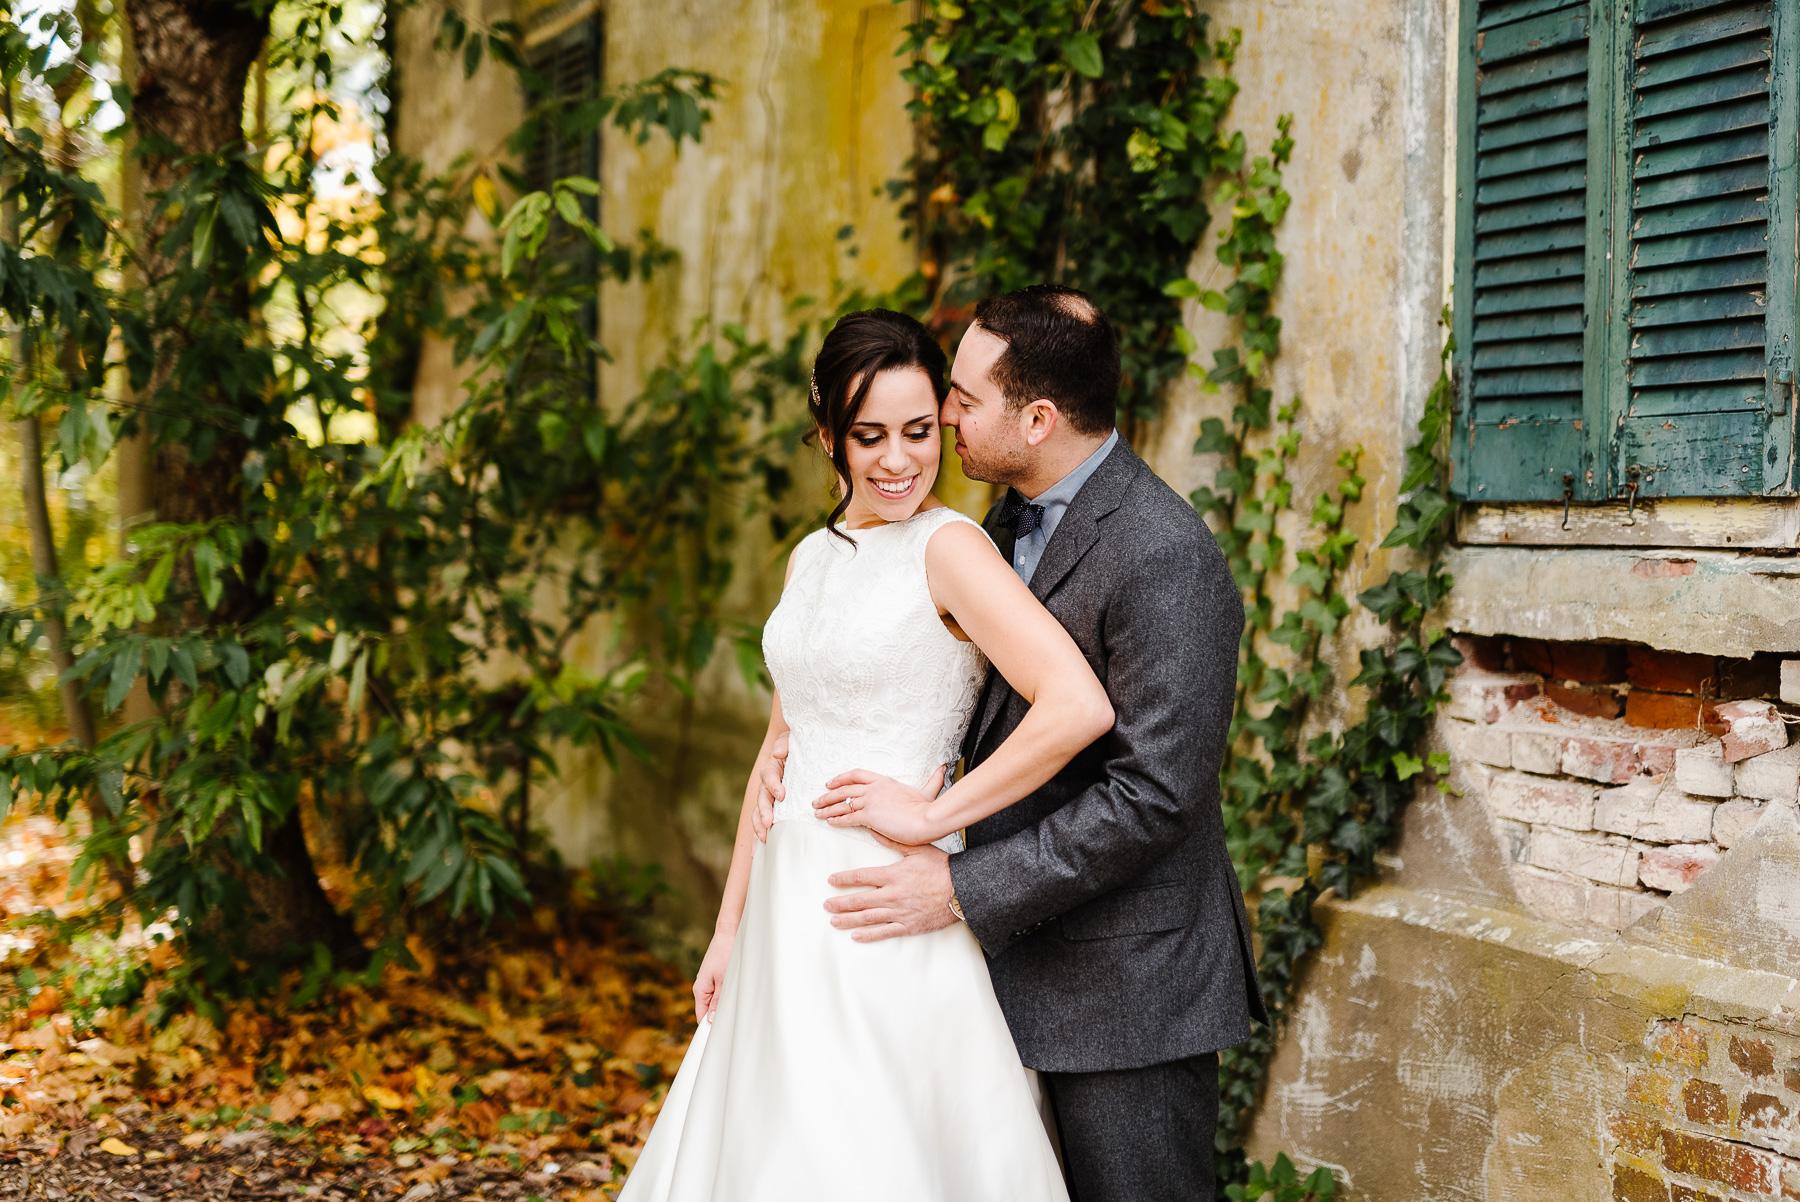 23-Laurita Winery Wedding New Jersey Wedding Photographer Laurita Winery Weddings Longbrook Photography.jpg